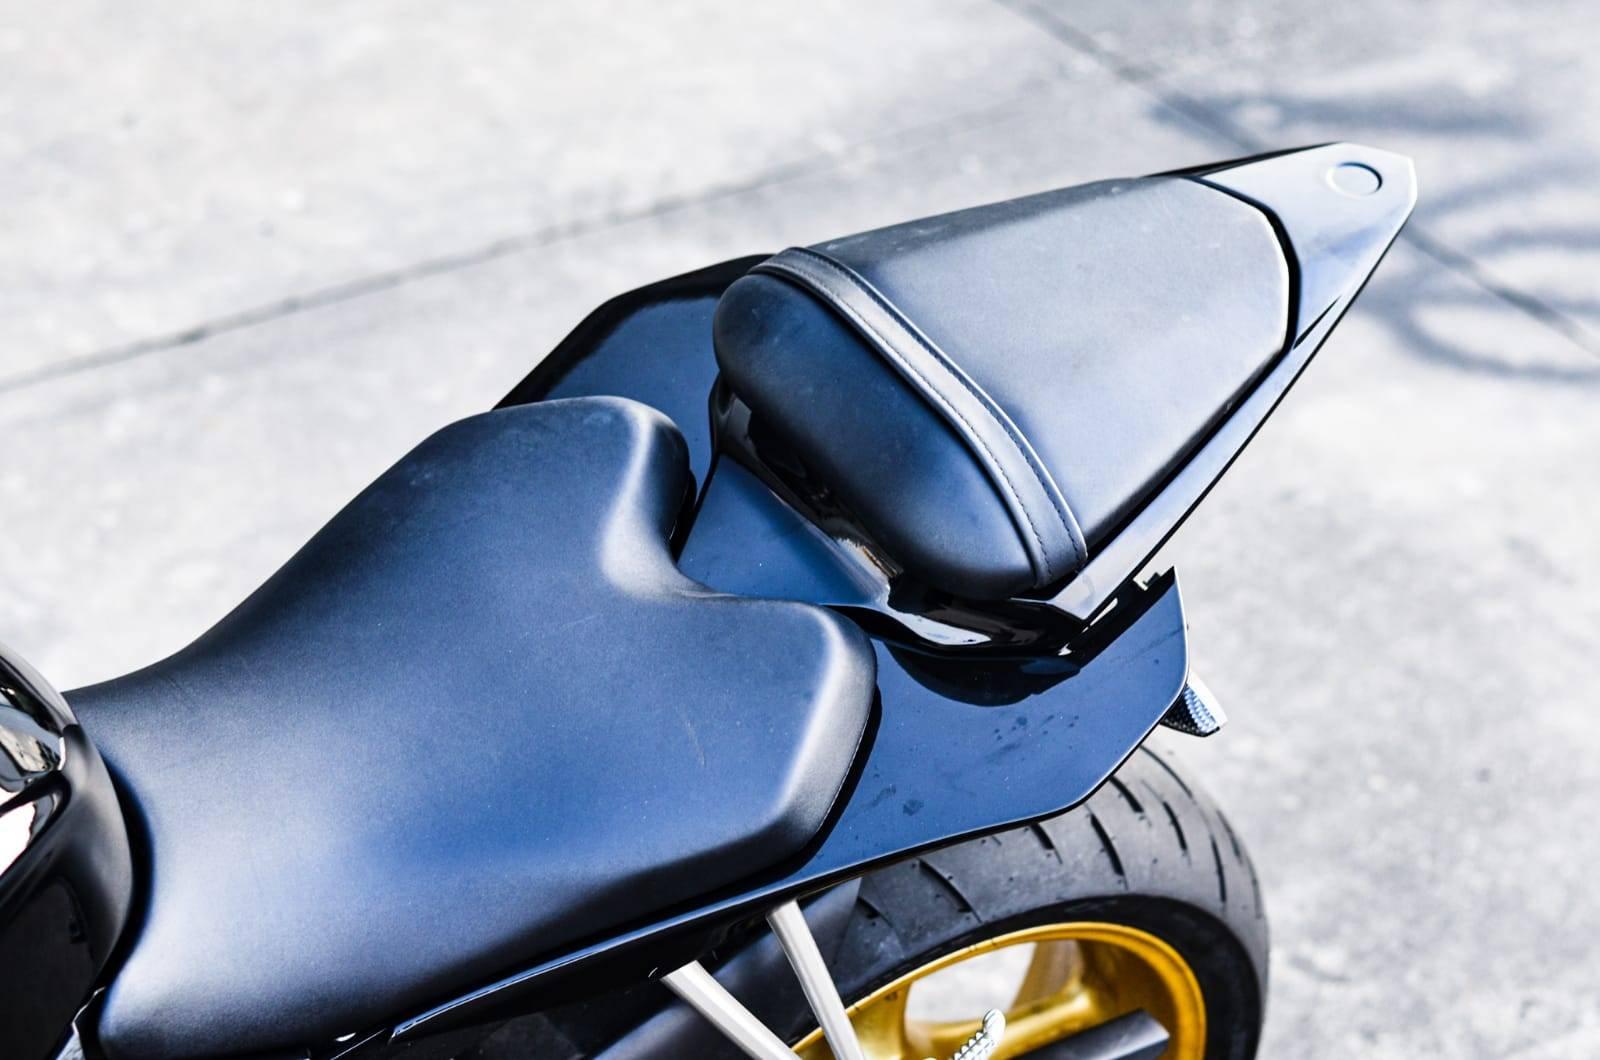 2009 Yamaha YZF-R6 10